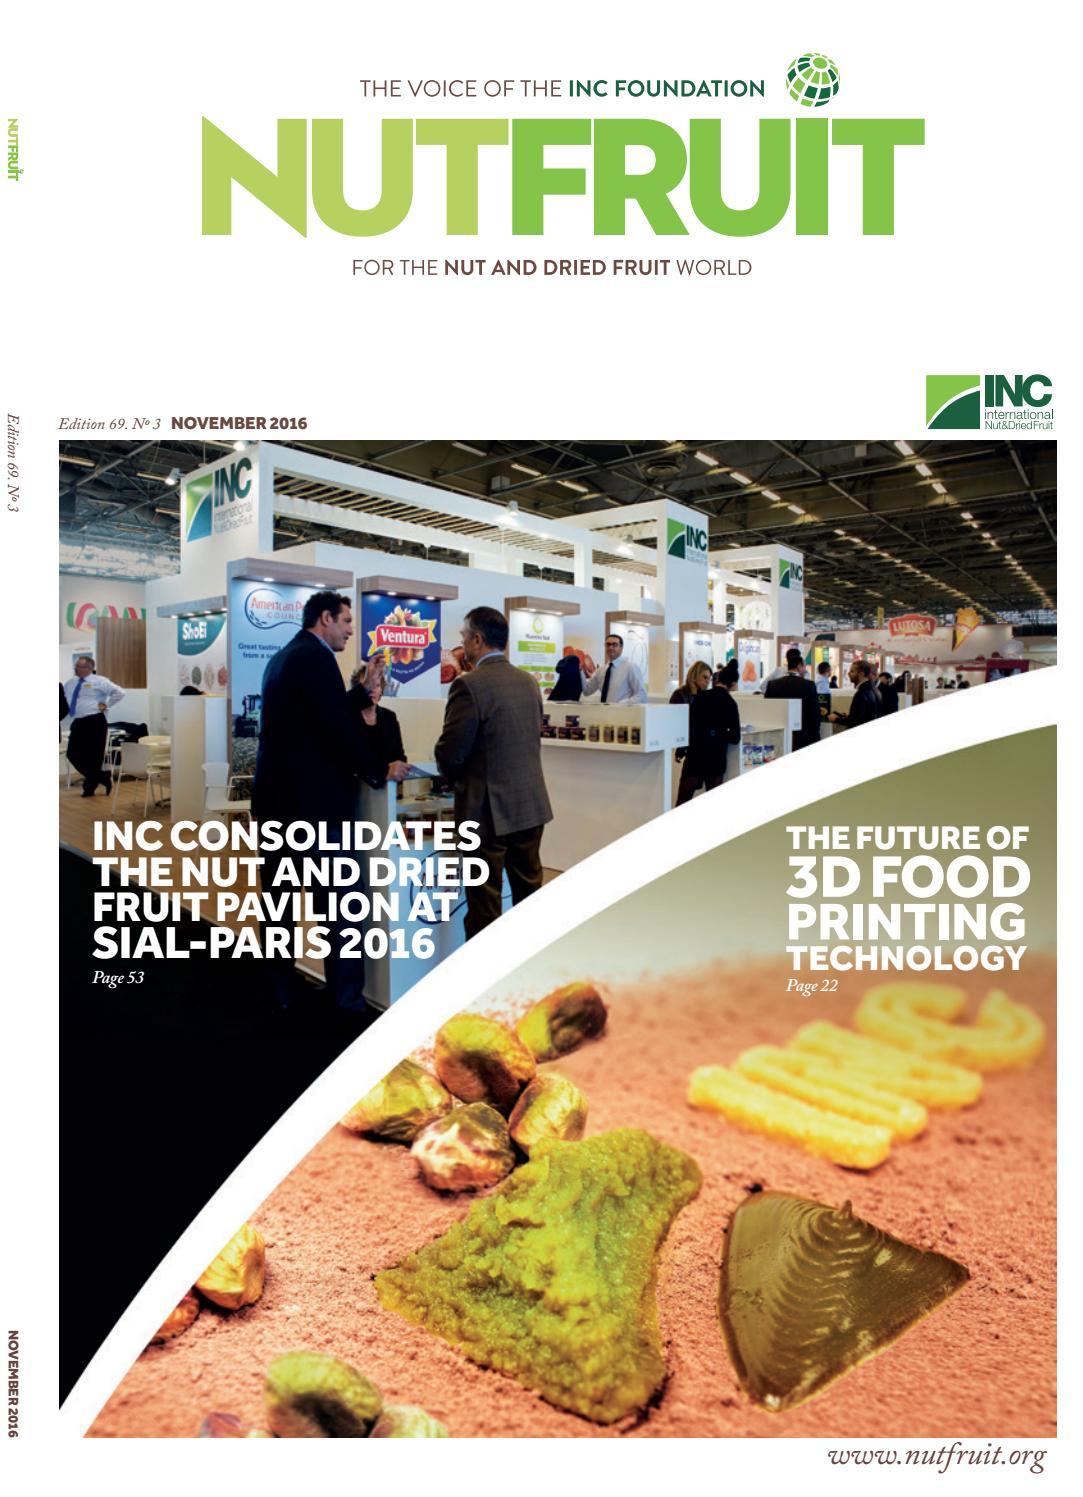 Nutfruit magazine, November 2016 by INC - International Nut & Dried